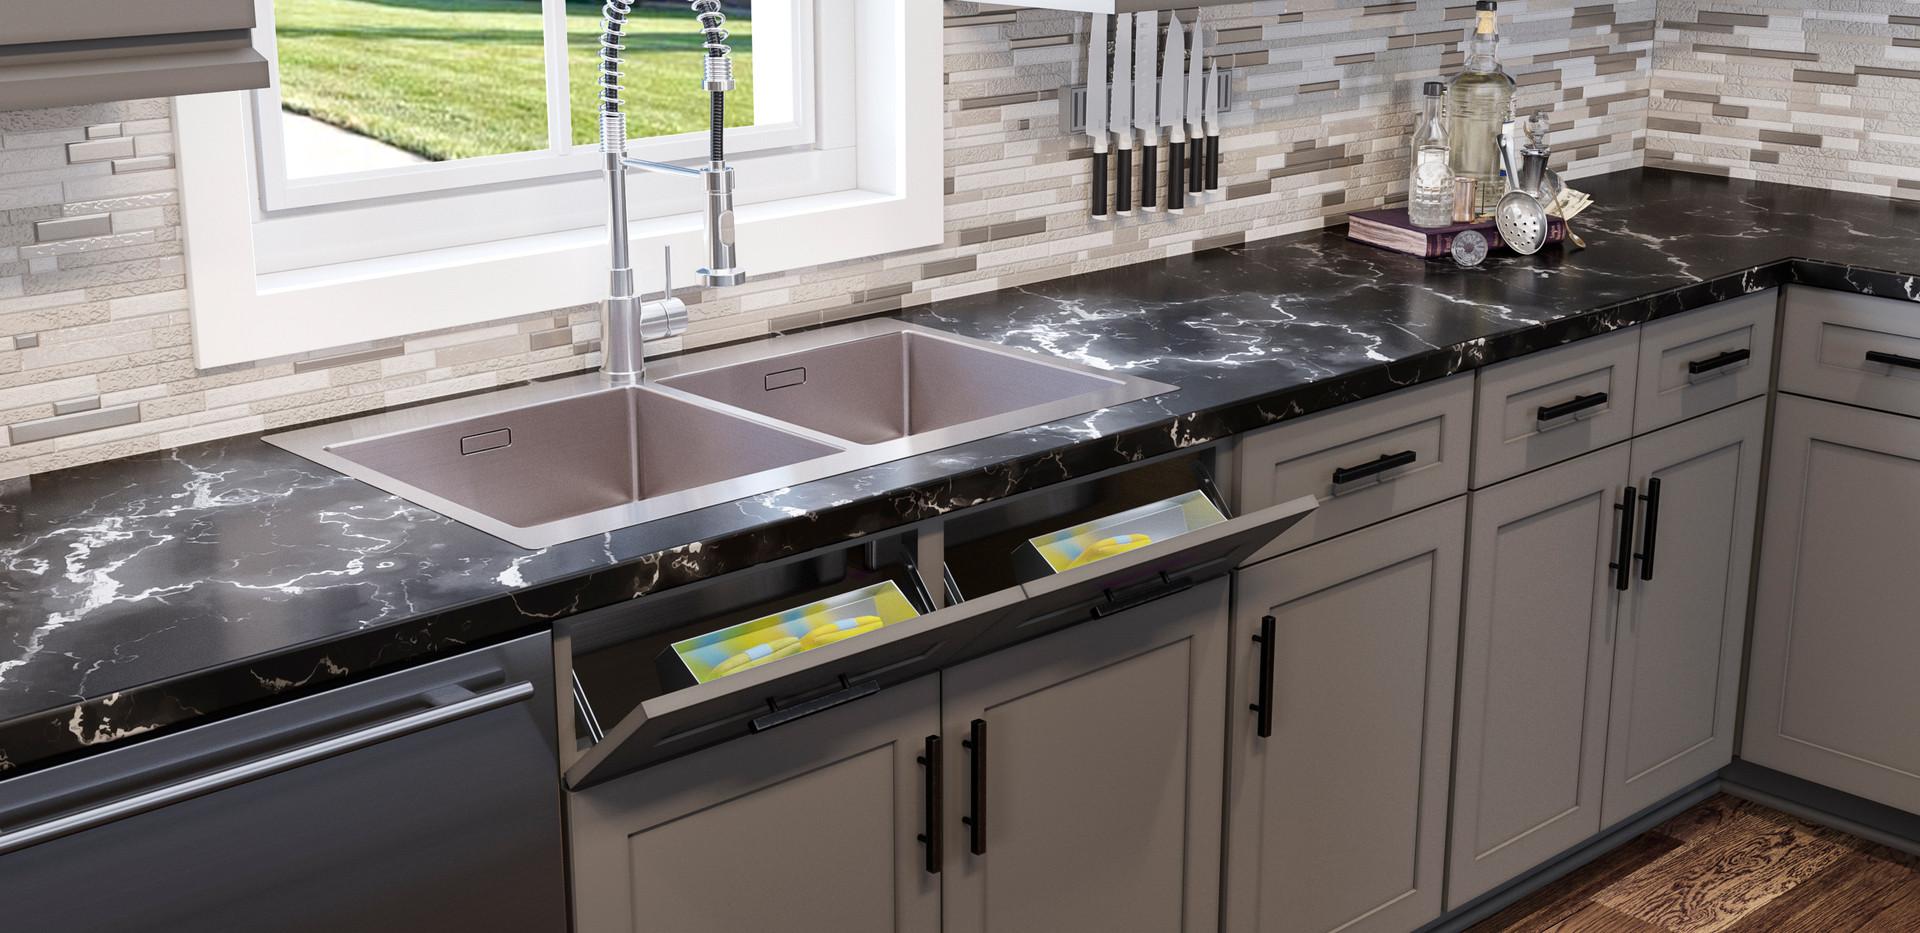 SG Kitchen Close-Up (Sink Base Tip Out T